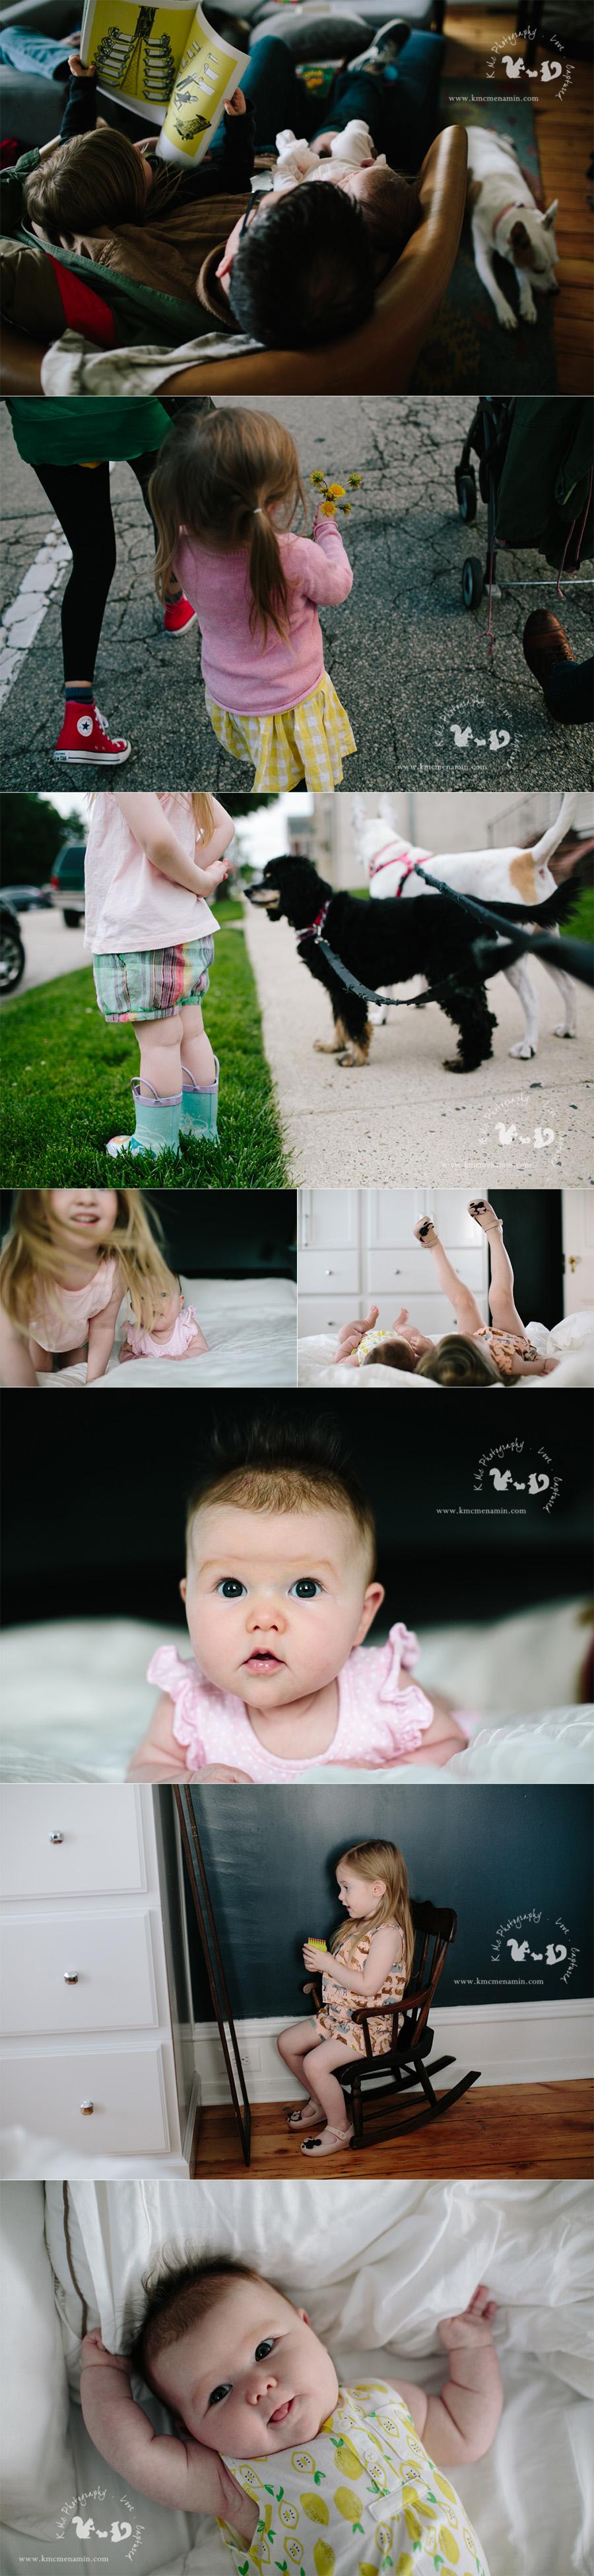 Conshohocken_Family_Photographer_14